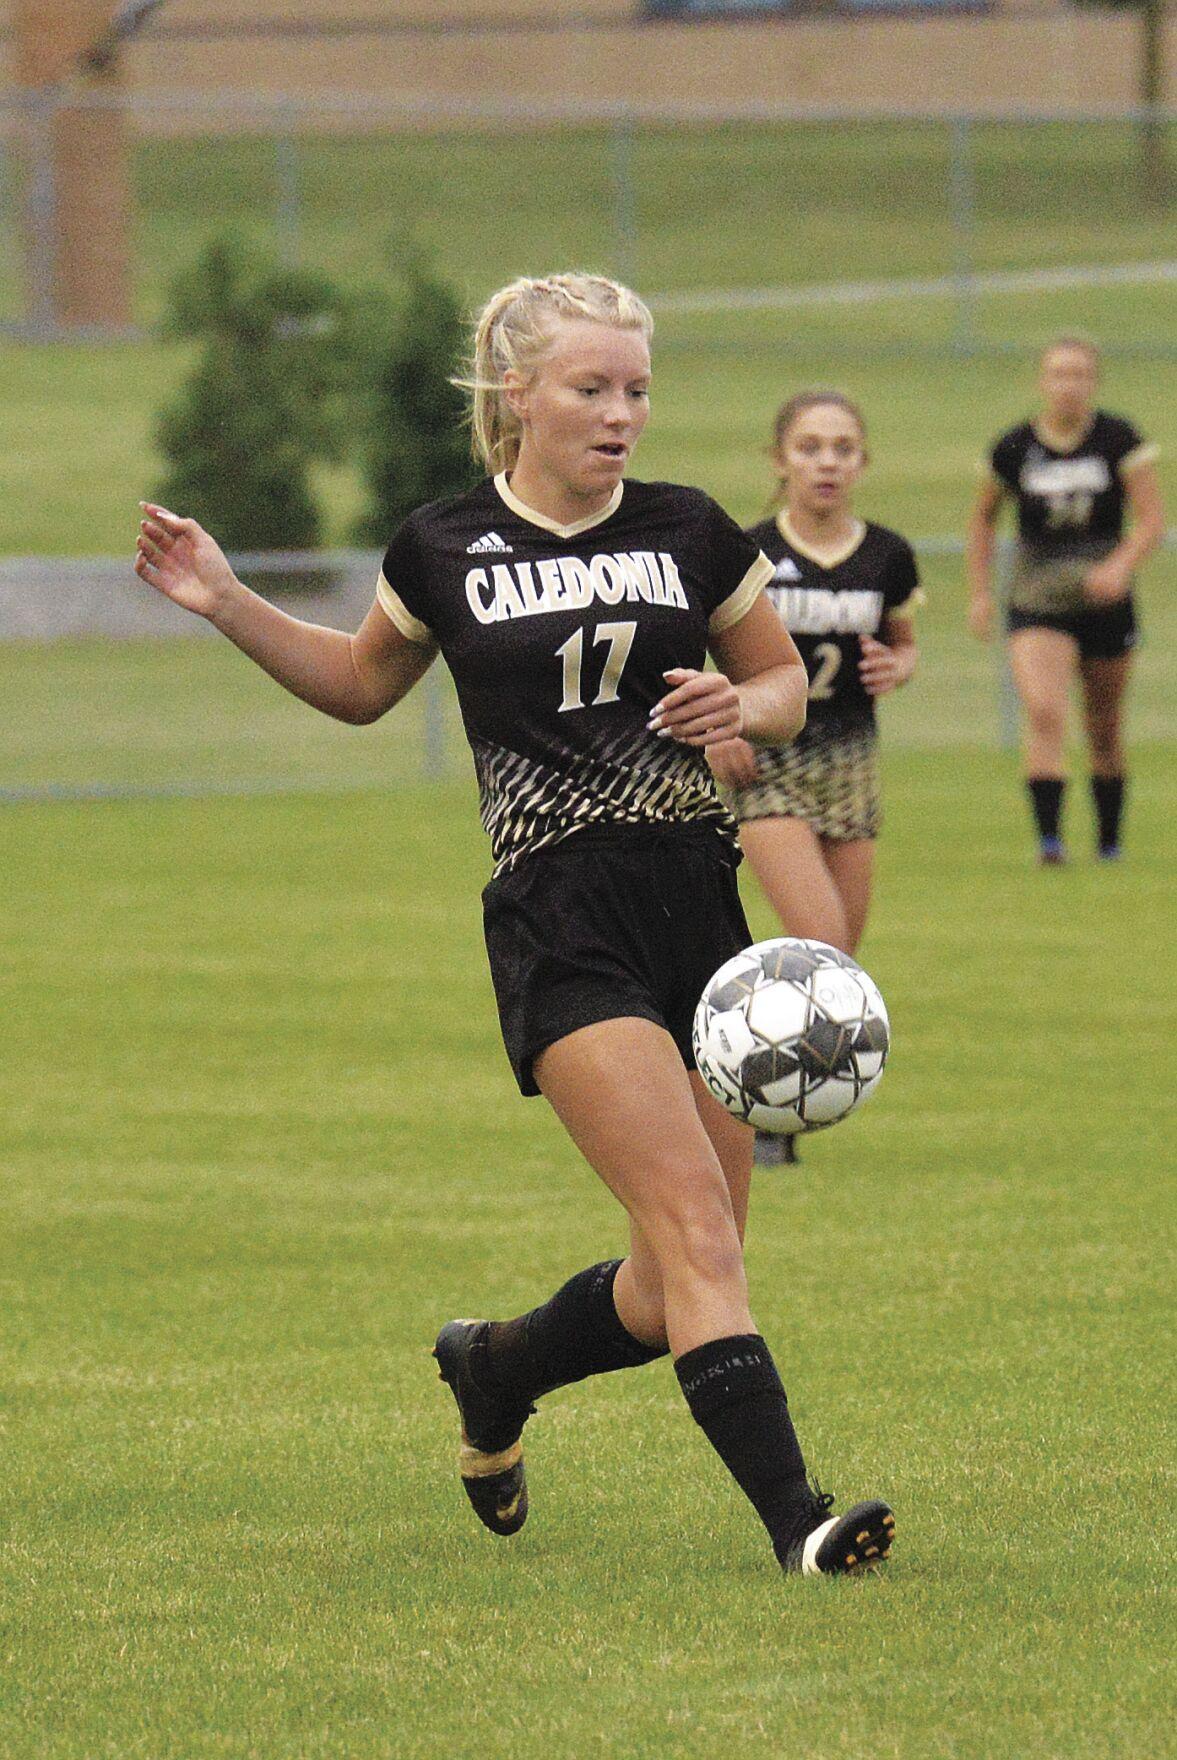 Cal soccer-Cameryn Kruse